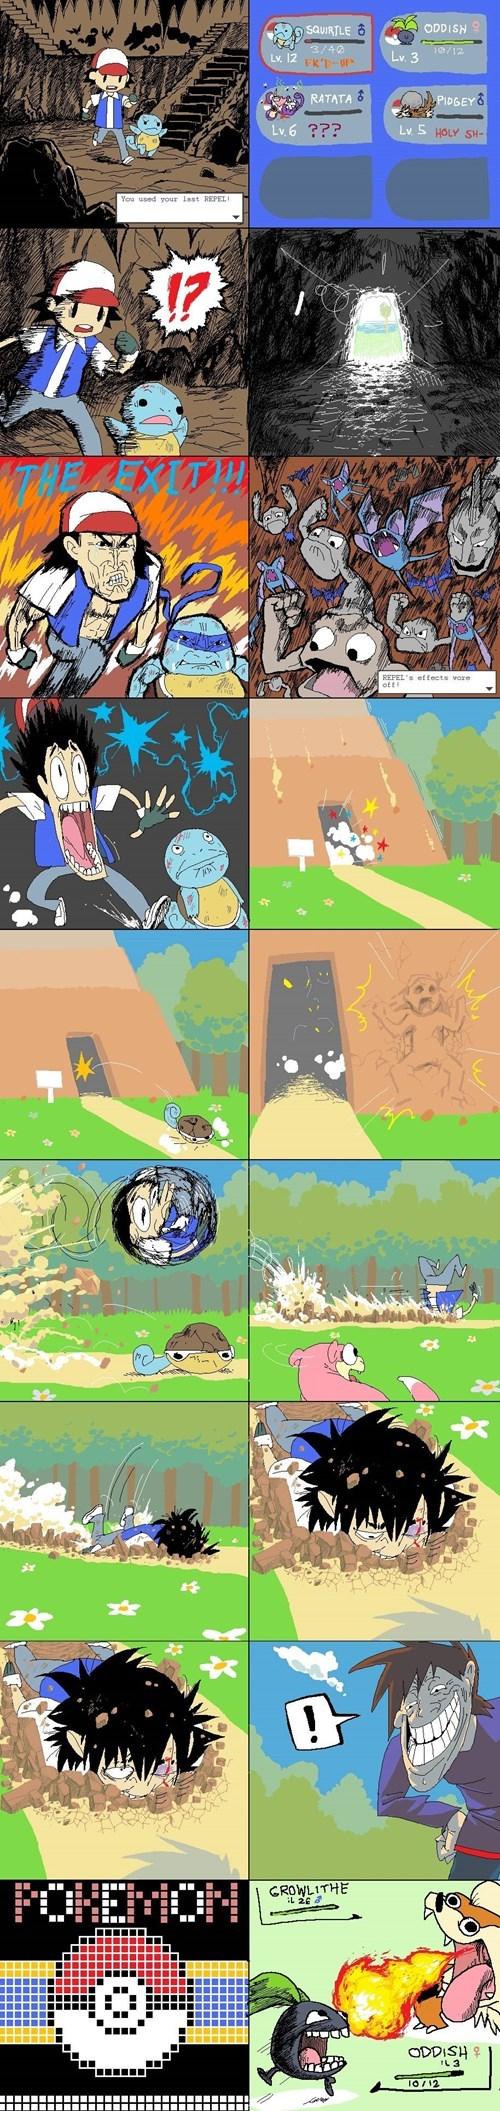 Pokémon gary oak web comics - 8105486336